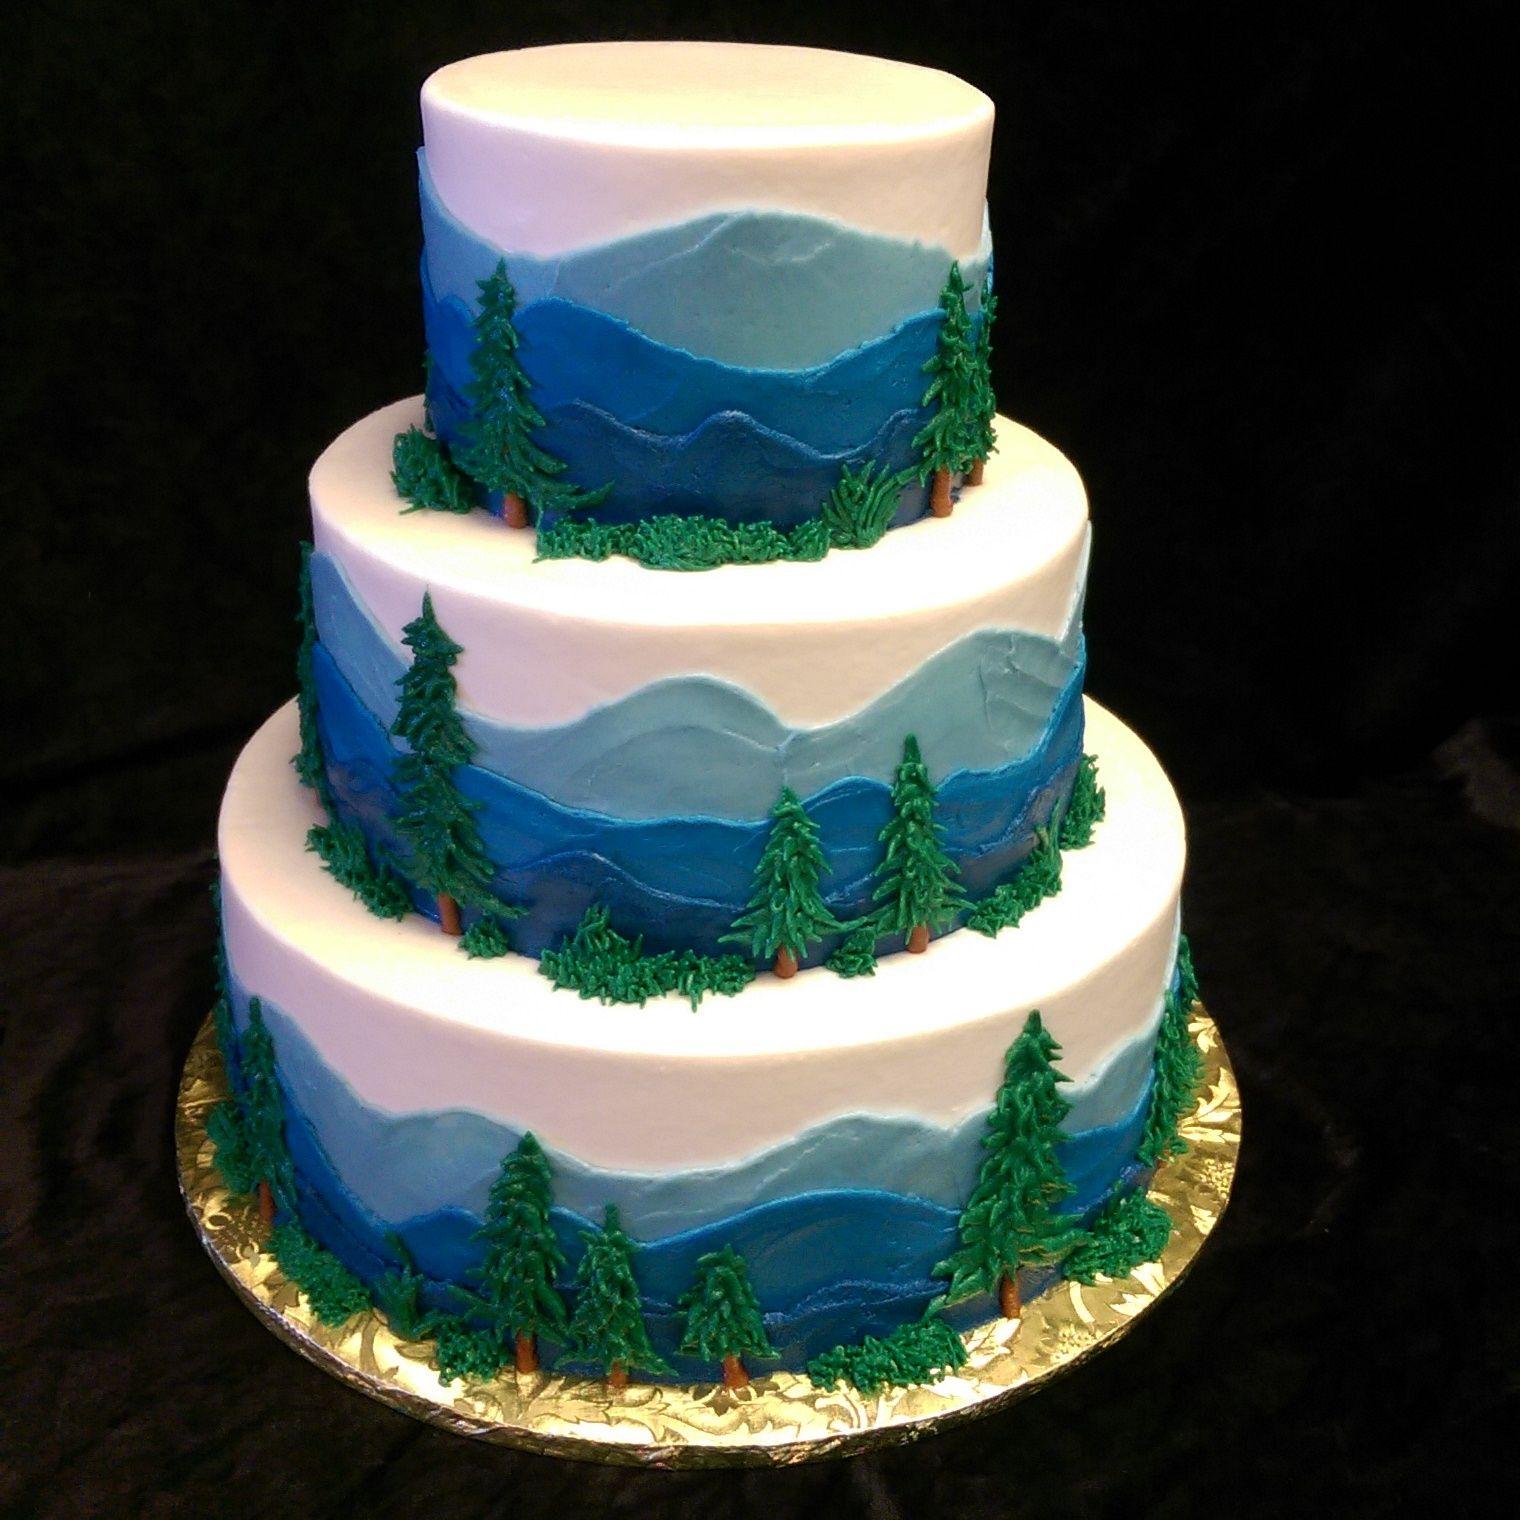 Wedding Cake Recipe Custom History: A Pacific Northwest Inspired Wedding Cake. Buttercream